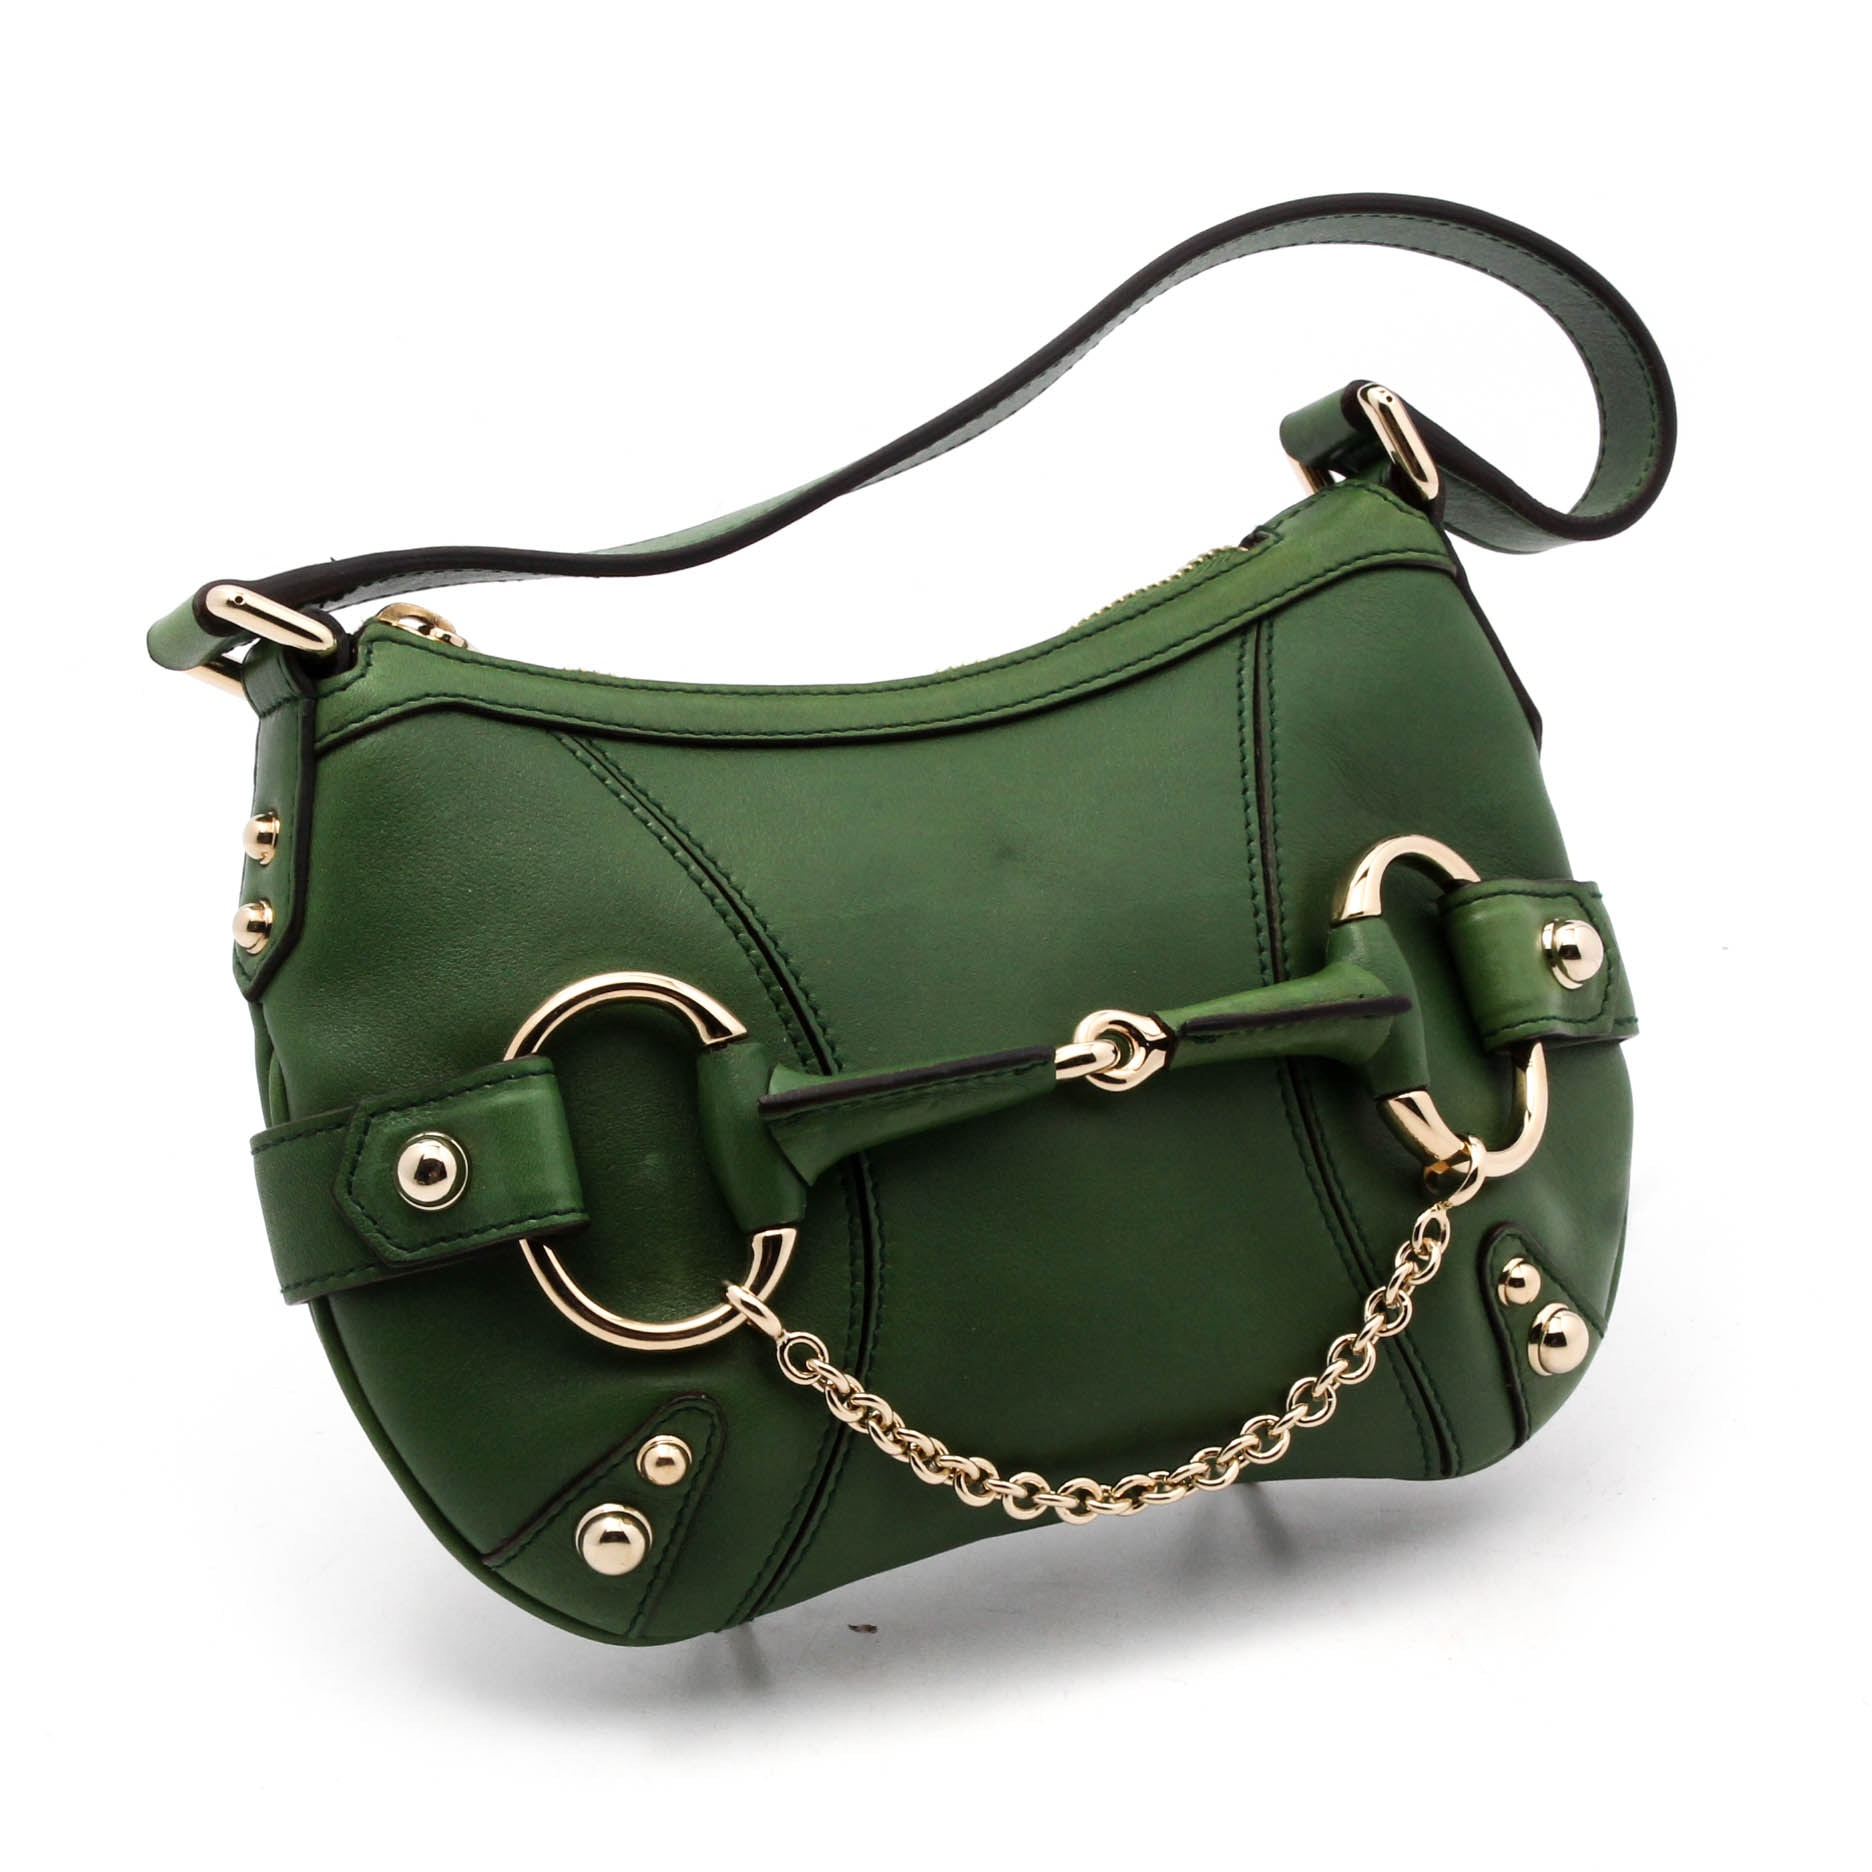 Gucci Green Leather Horse Bit Baguette